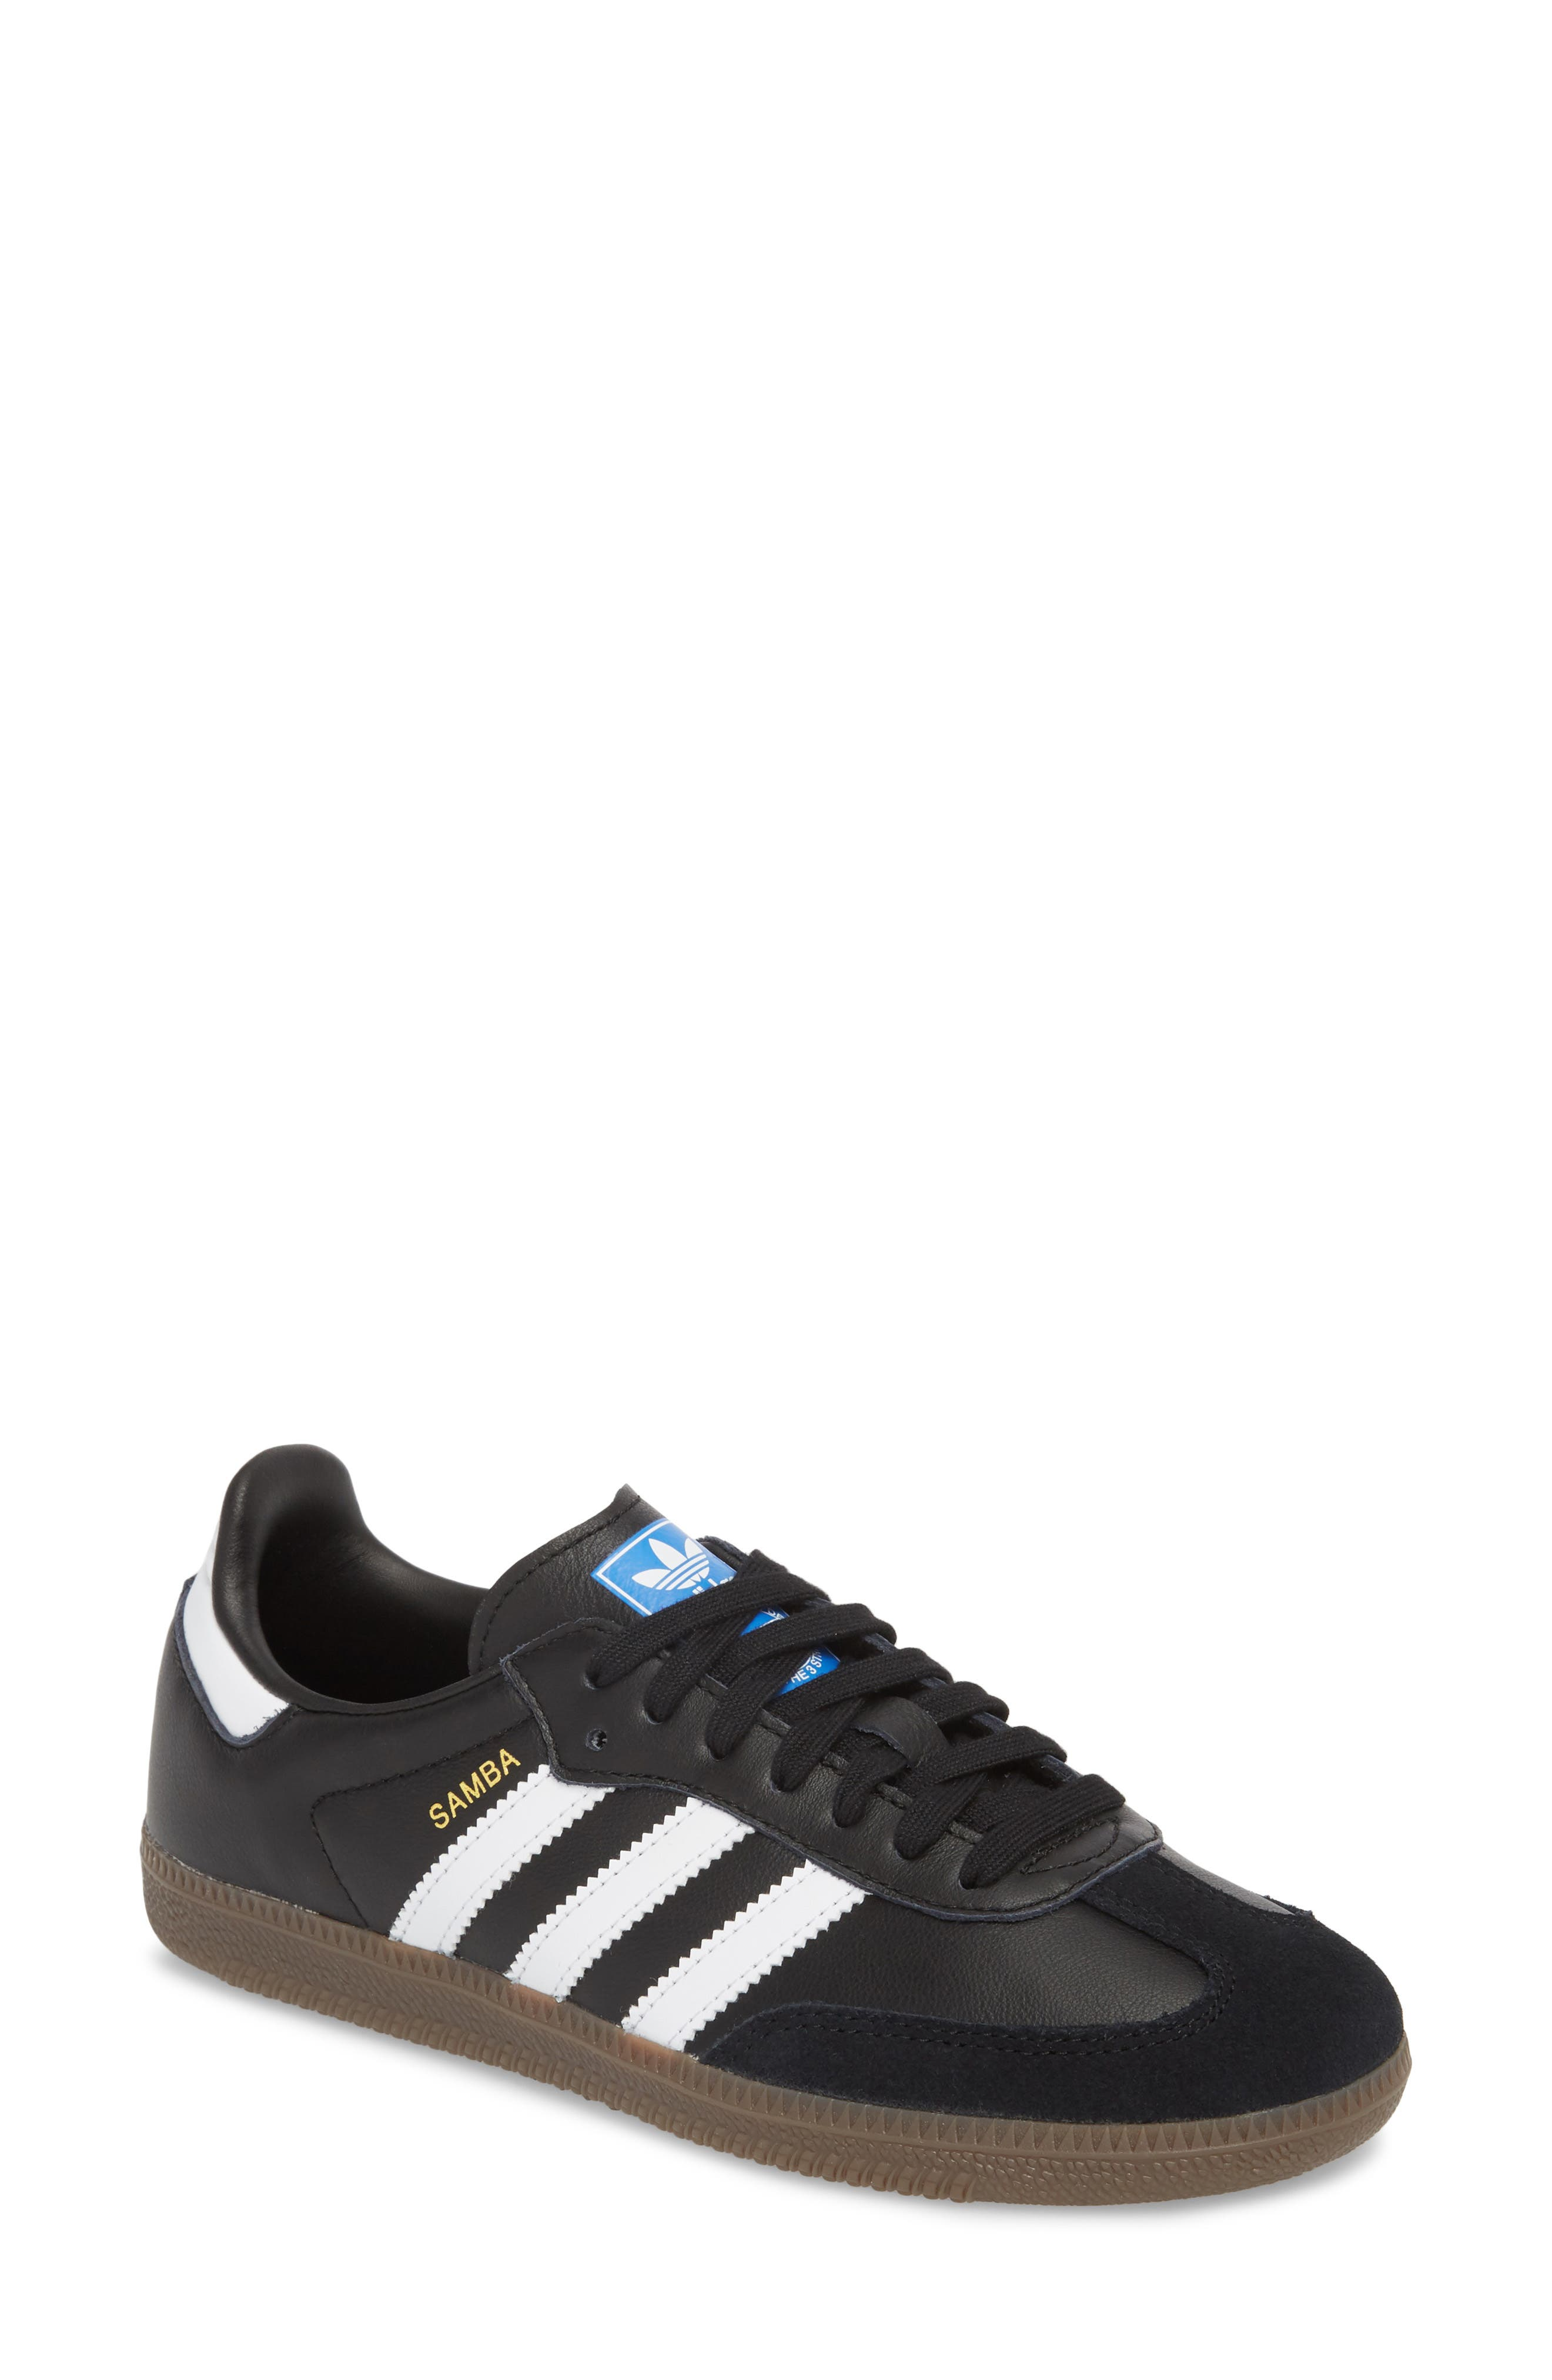 'Samba' Sneaker,                             Main thumbnail 1, color,                             BLACK/ WHITE/ GUM5